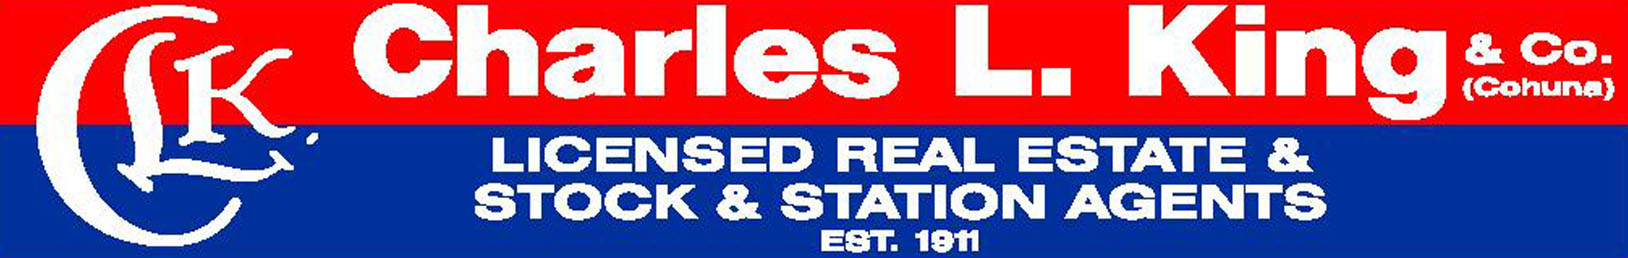 Charles L King & Co (Cohuna) Pty Ltd